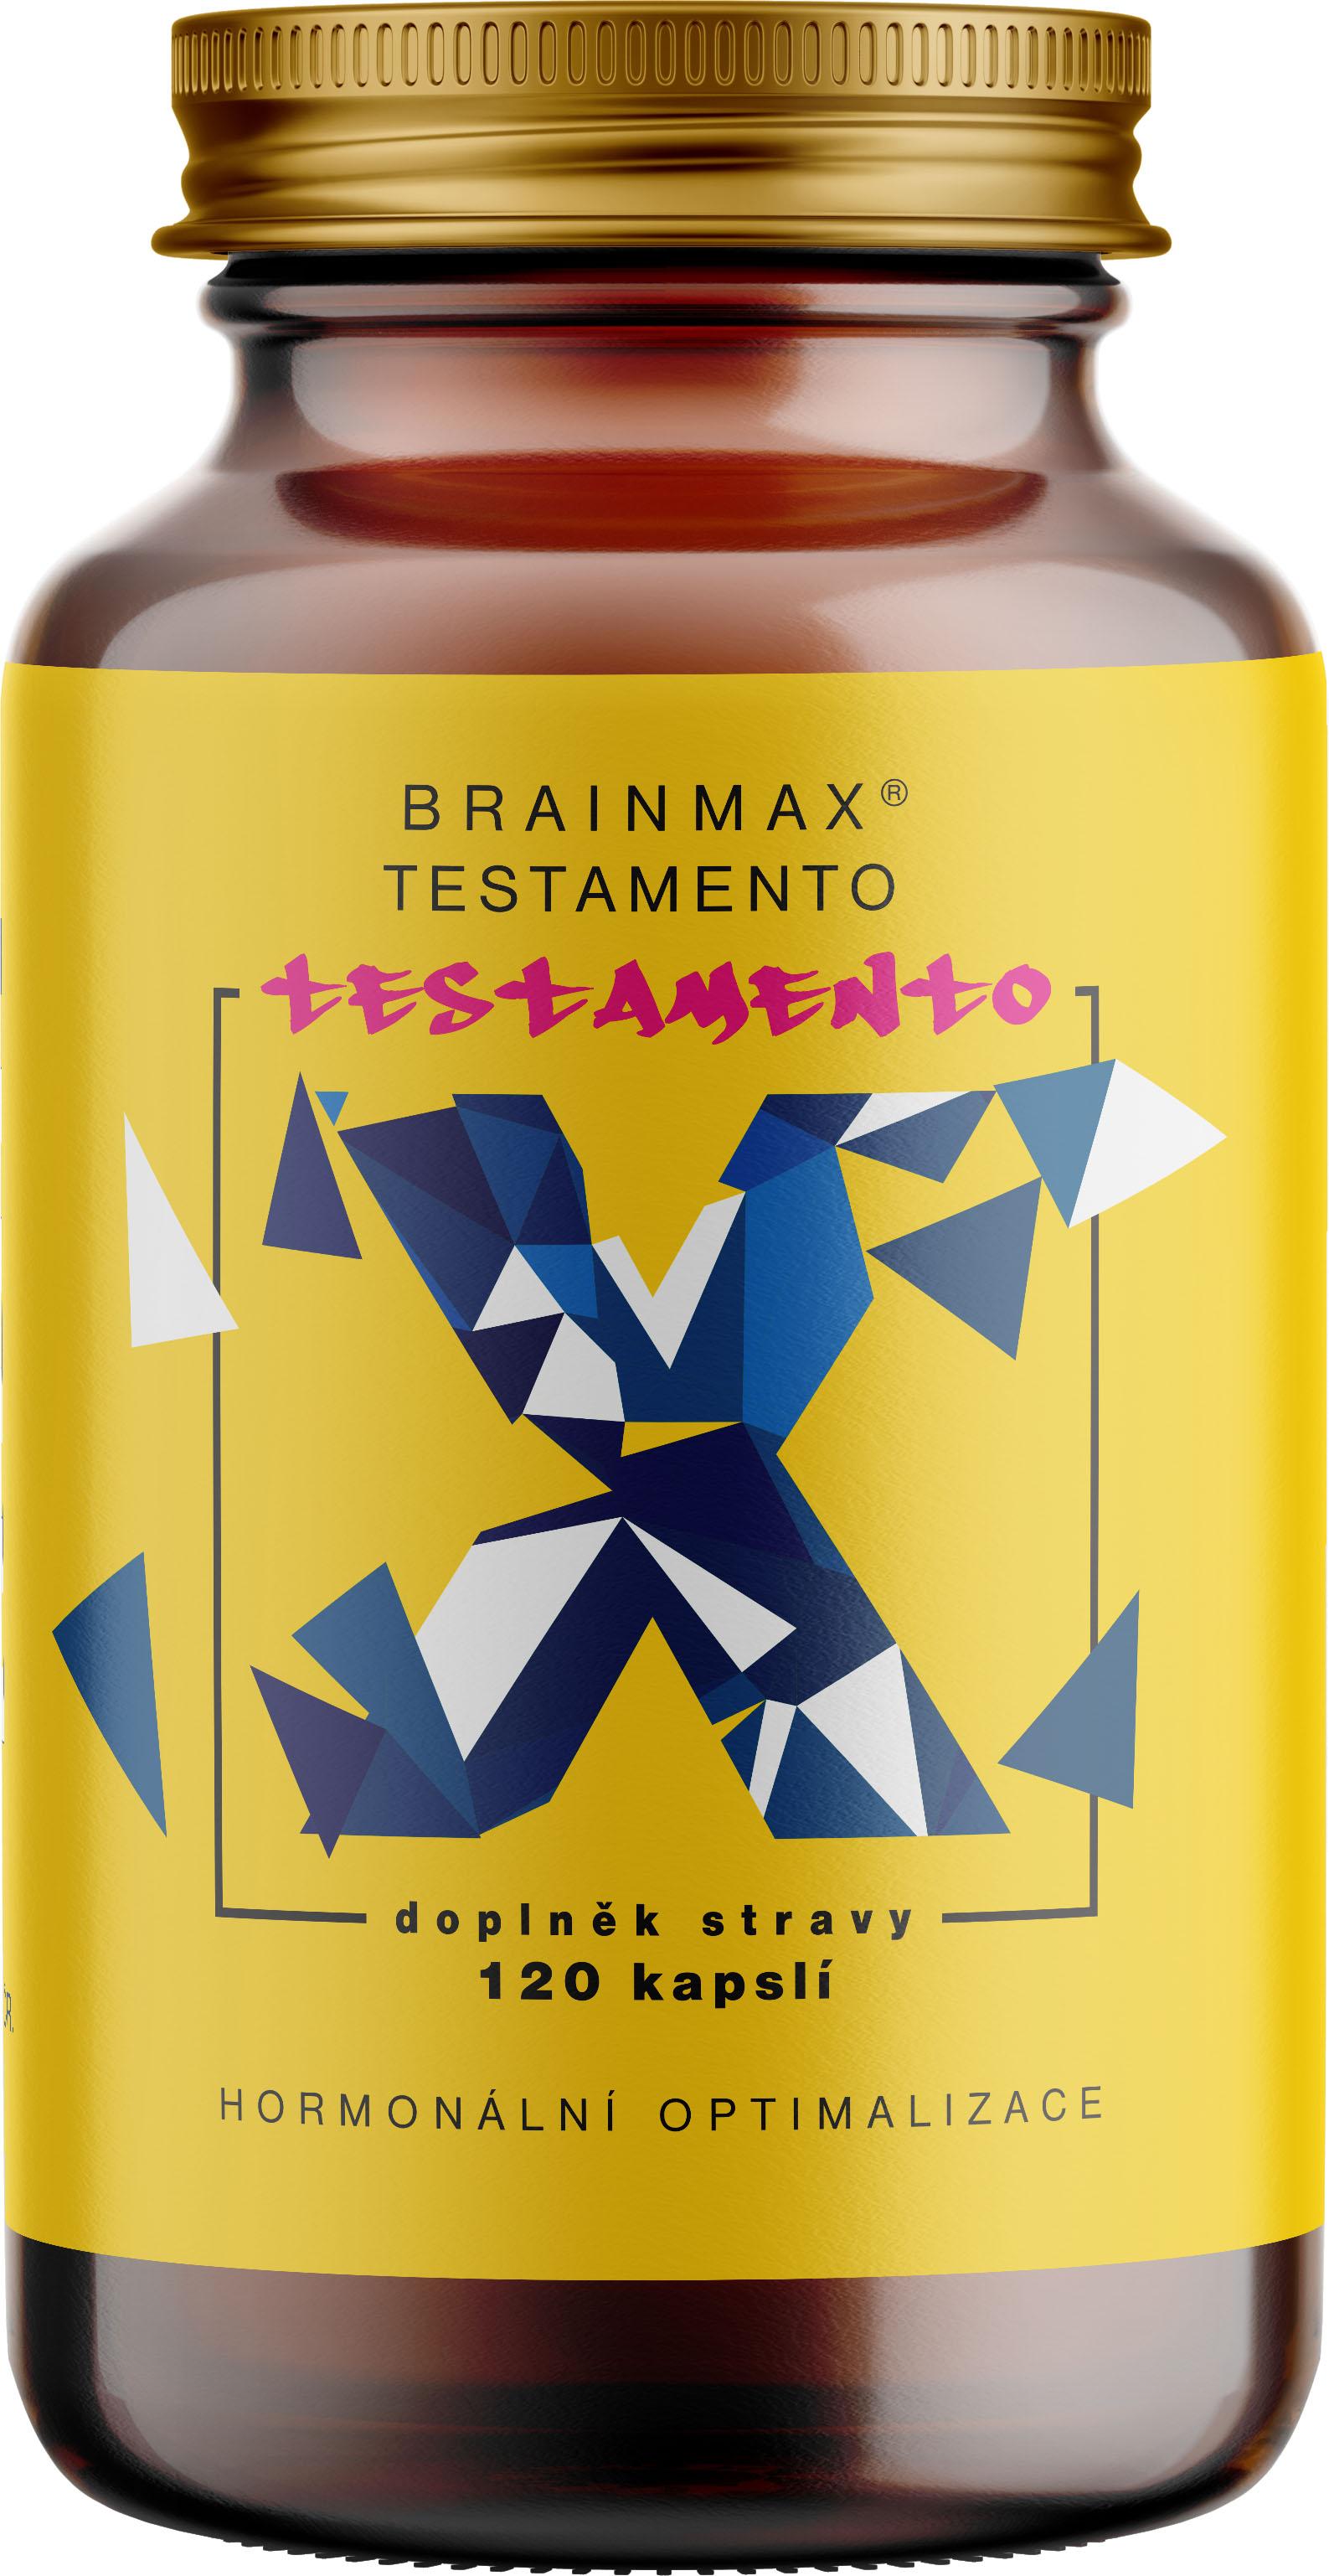 Votamax BrainMax Testamento 120 tablet